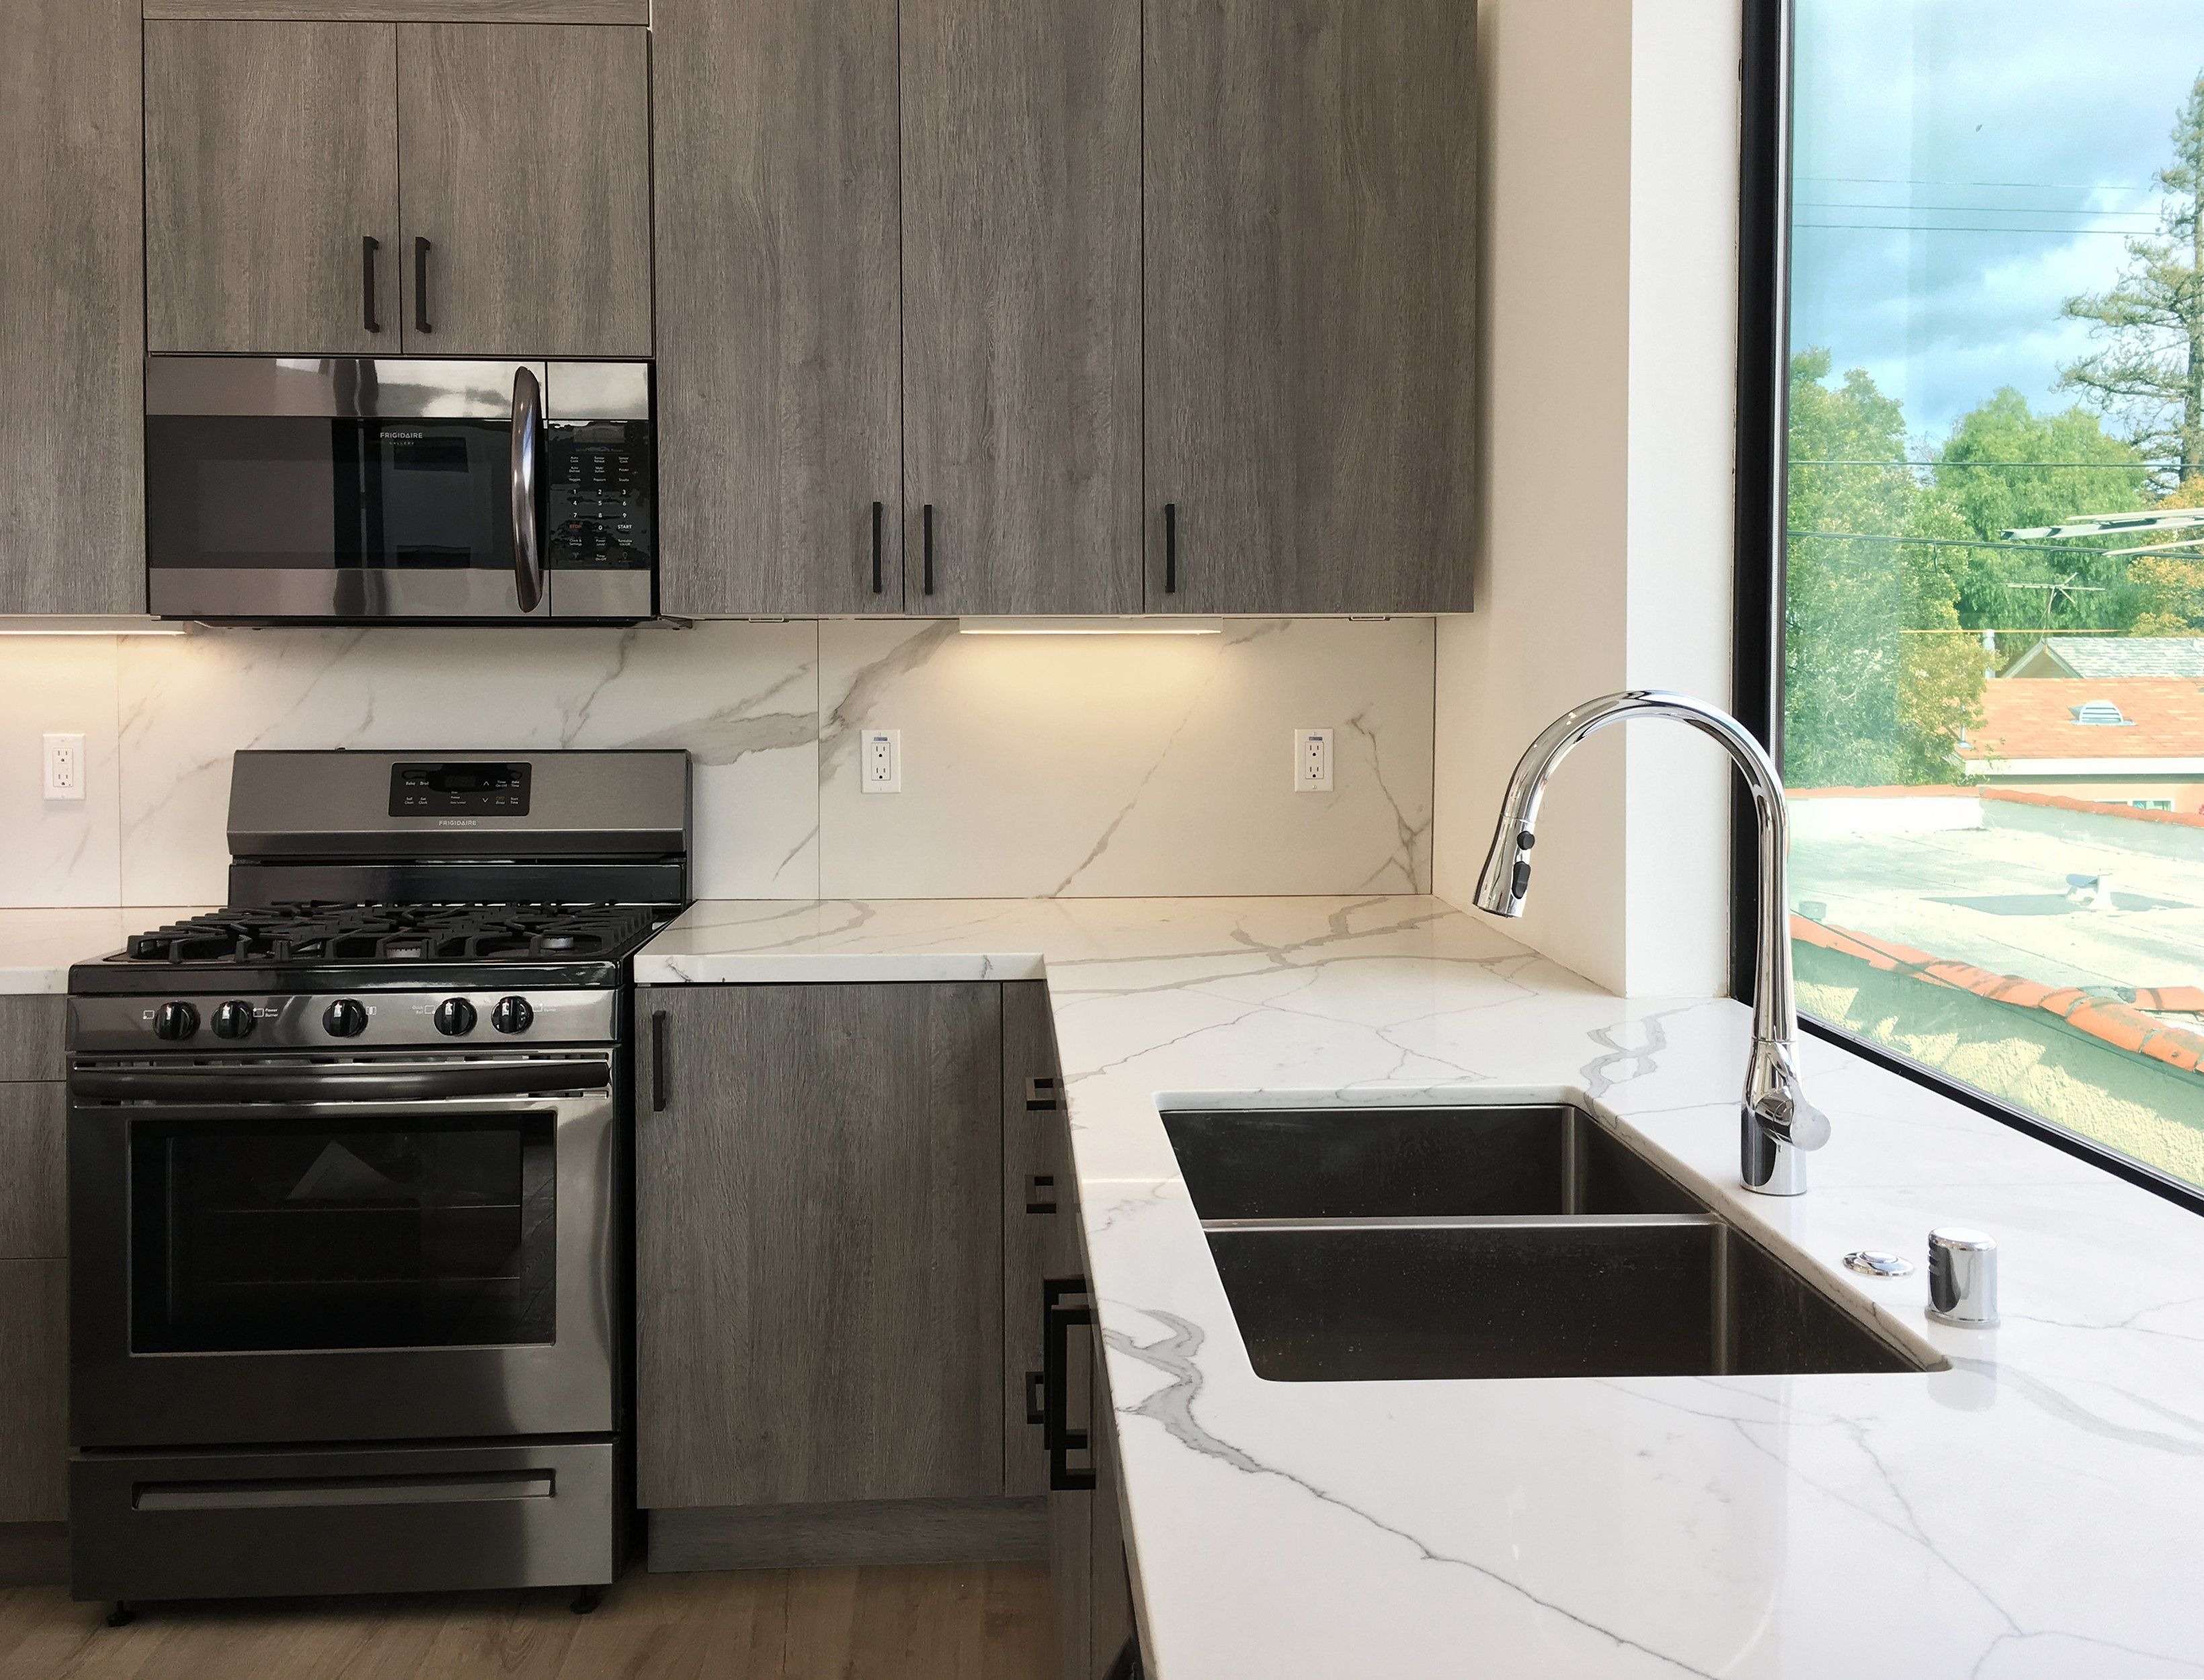 Sleek Quarry Kitchen In Culver City In 2019 Minimalist Living